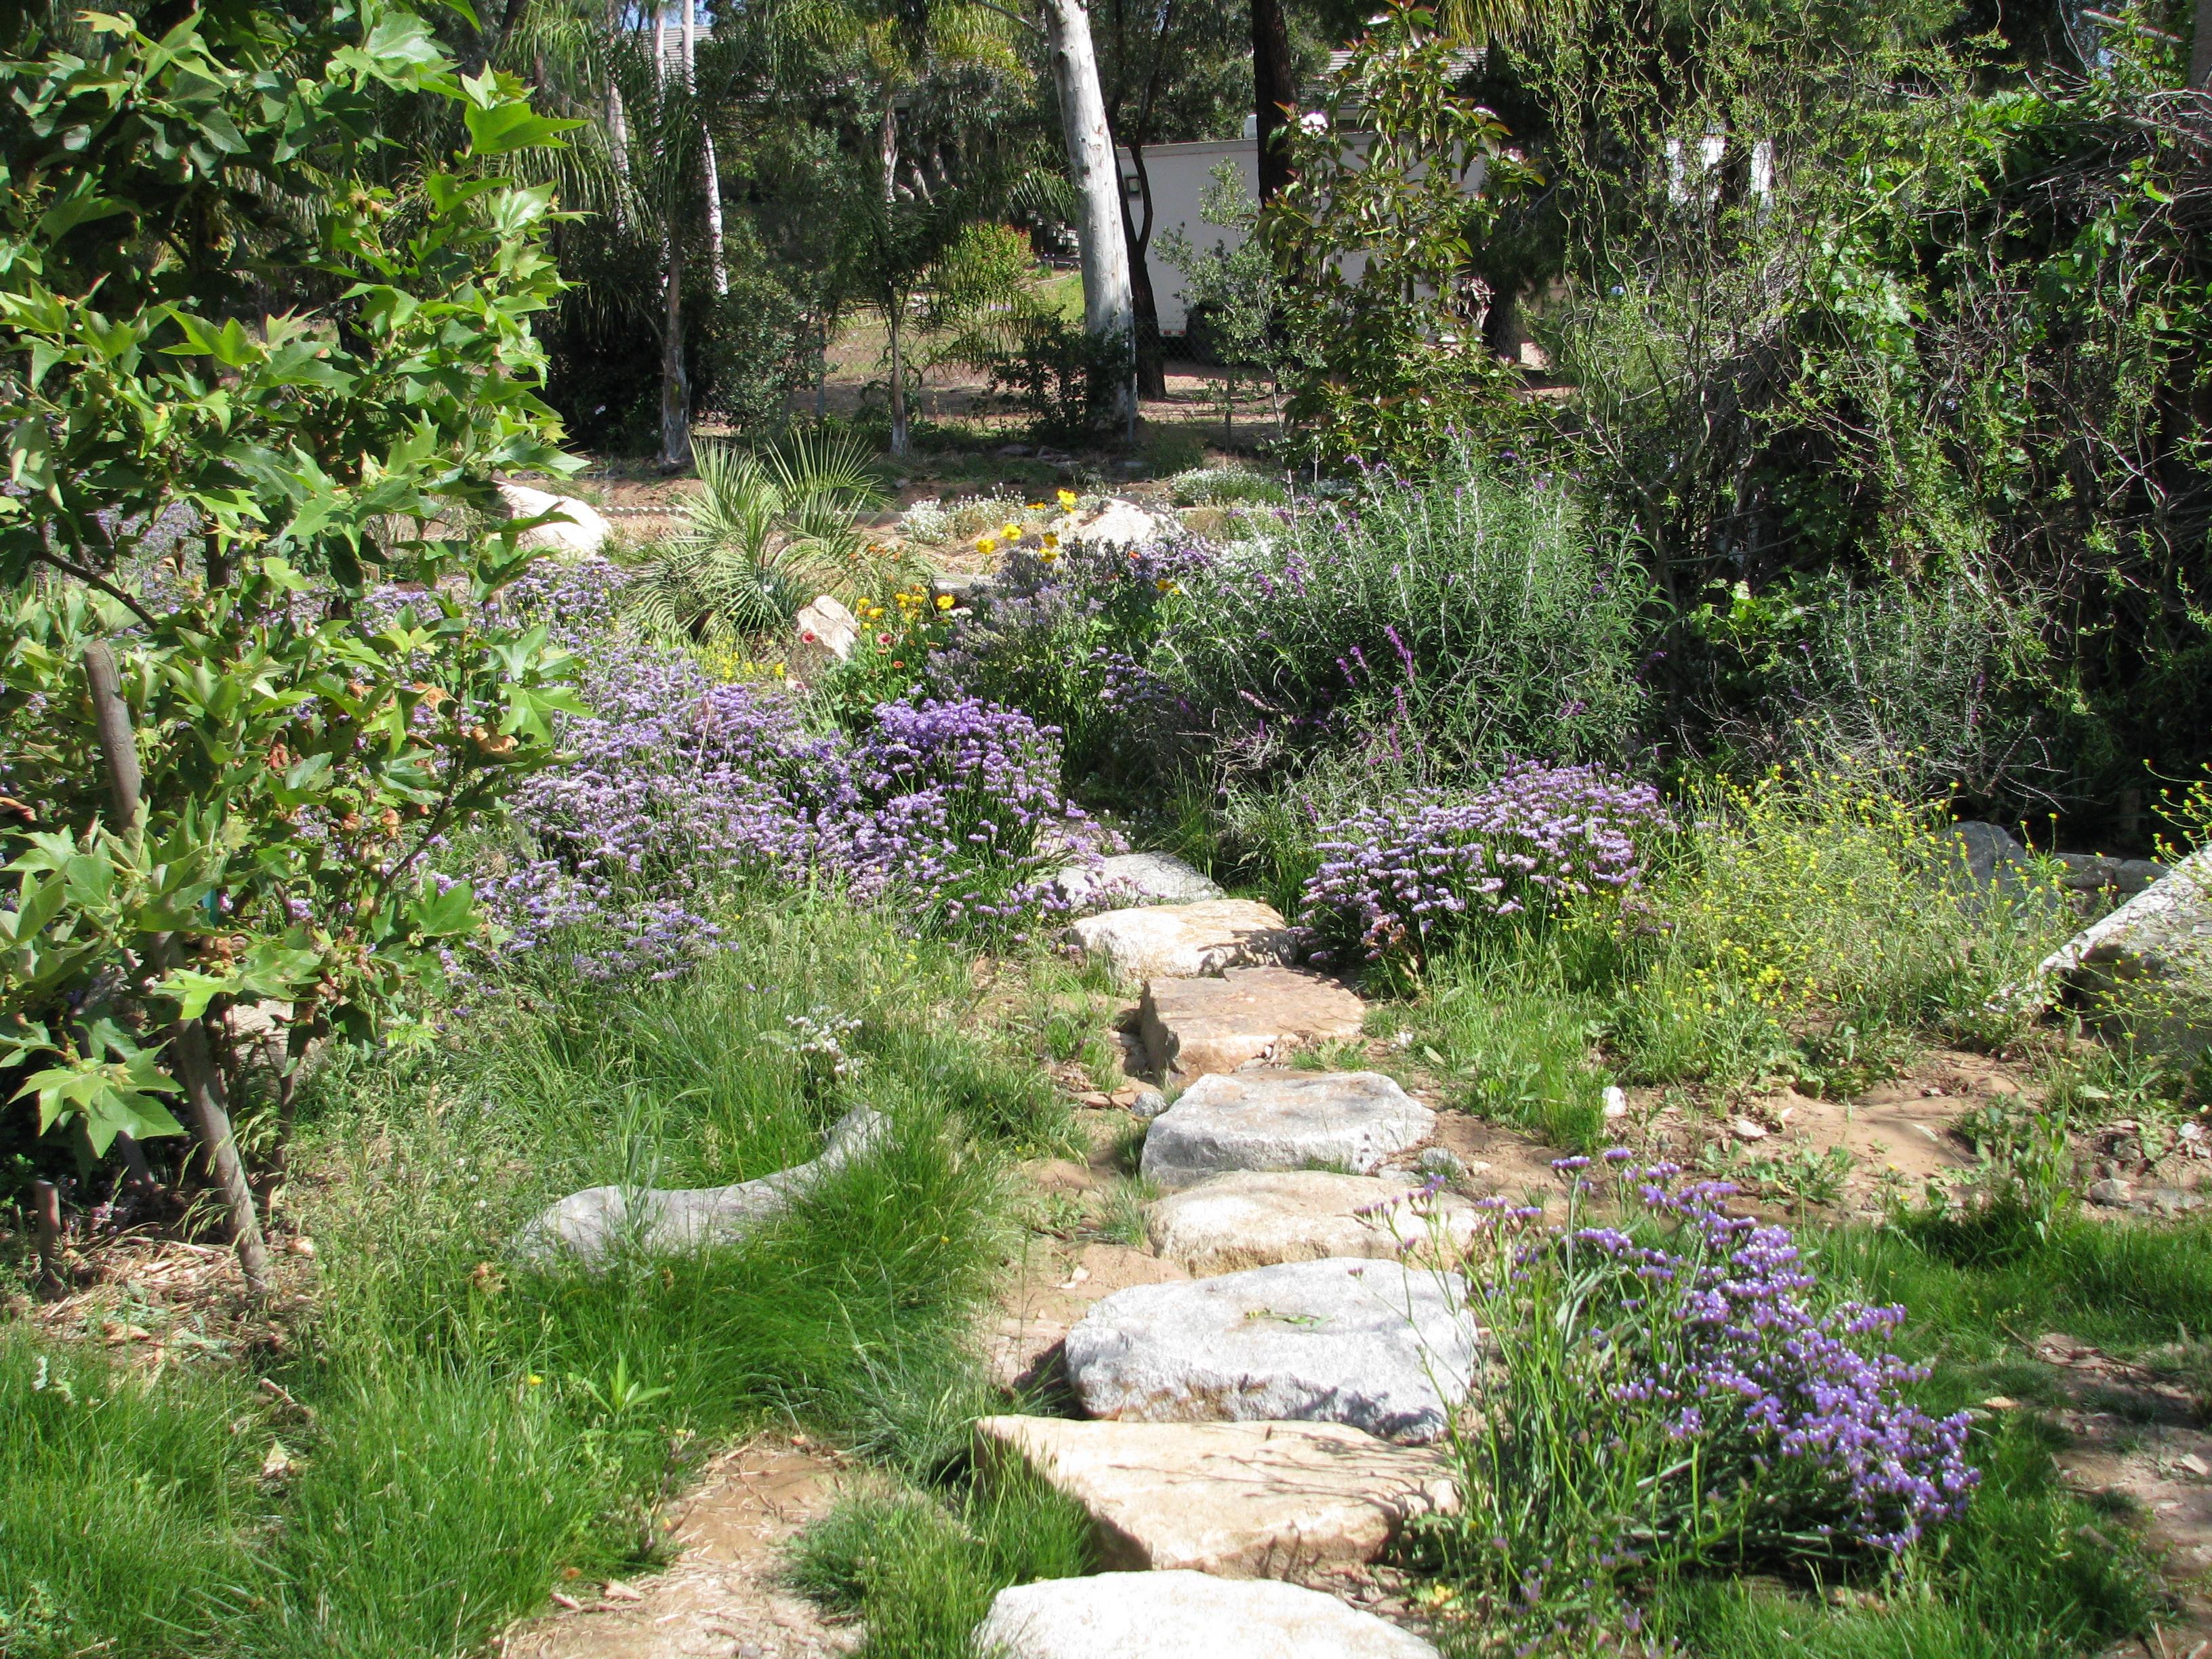 Status and wildflowers across the stone walkway | Vegetariat